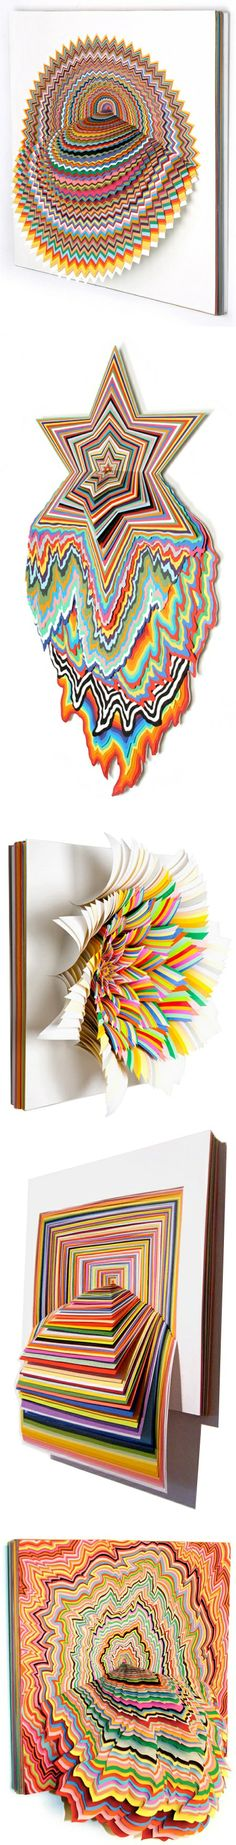 Jen Stark Modern Paper Art.